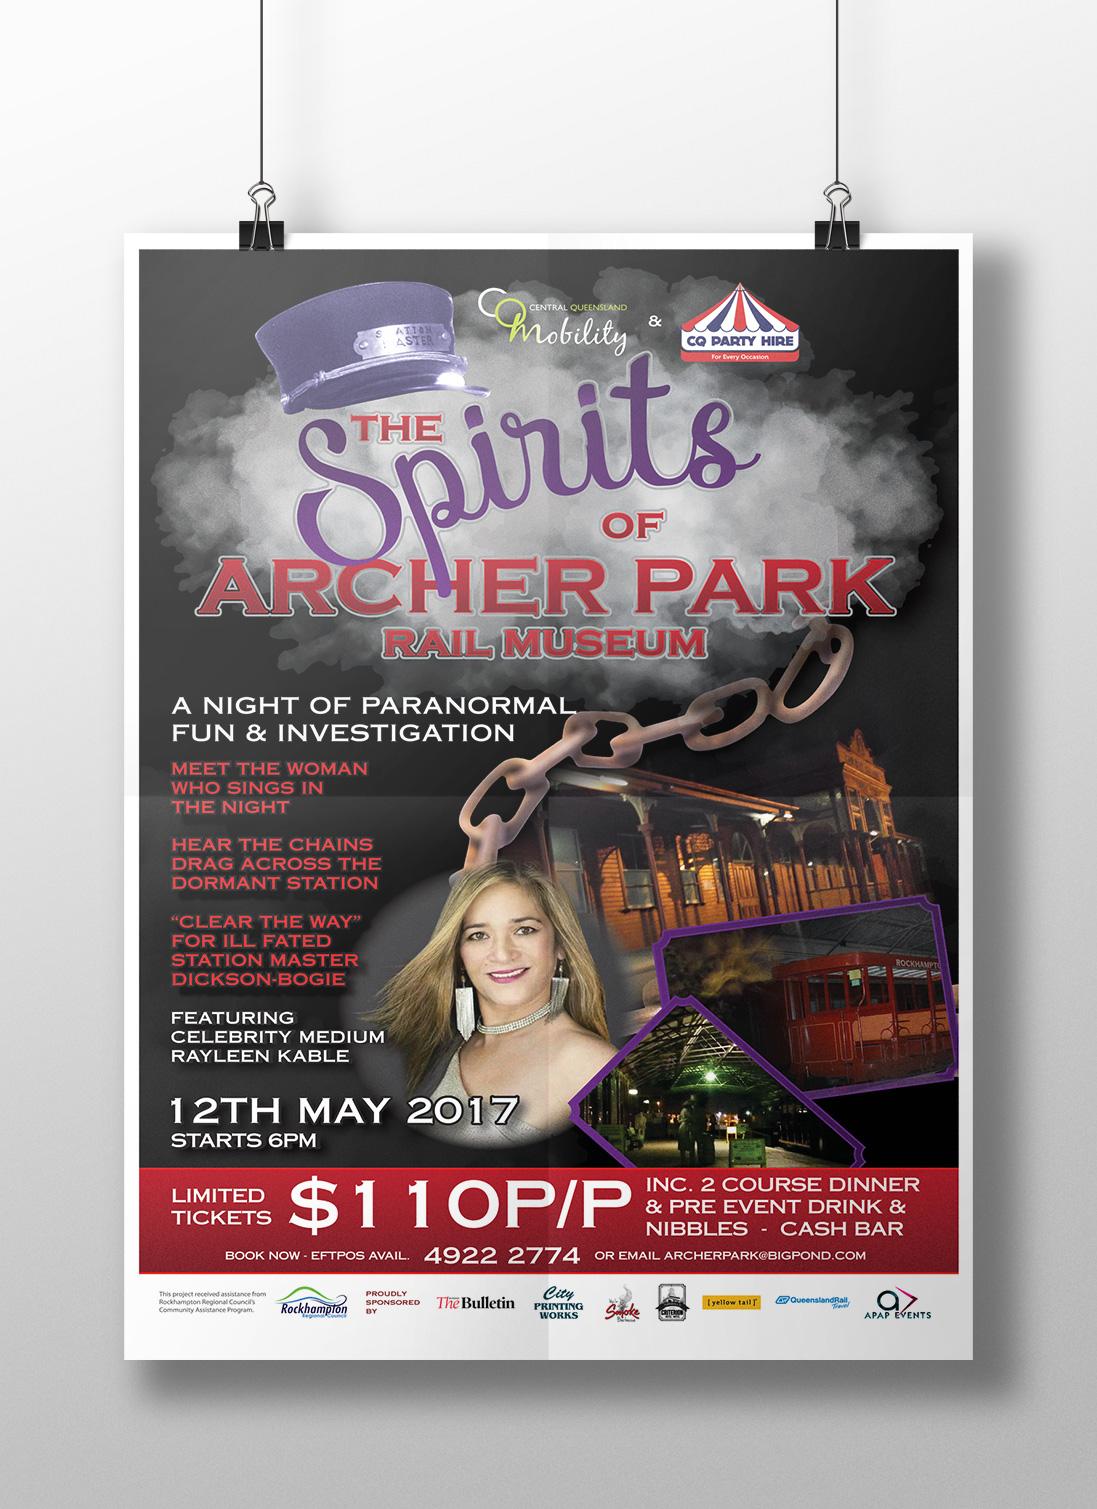 APAP Events Event Management and Graphic Design Rockhampton Spirits of Archer Park Poster and Logo Design